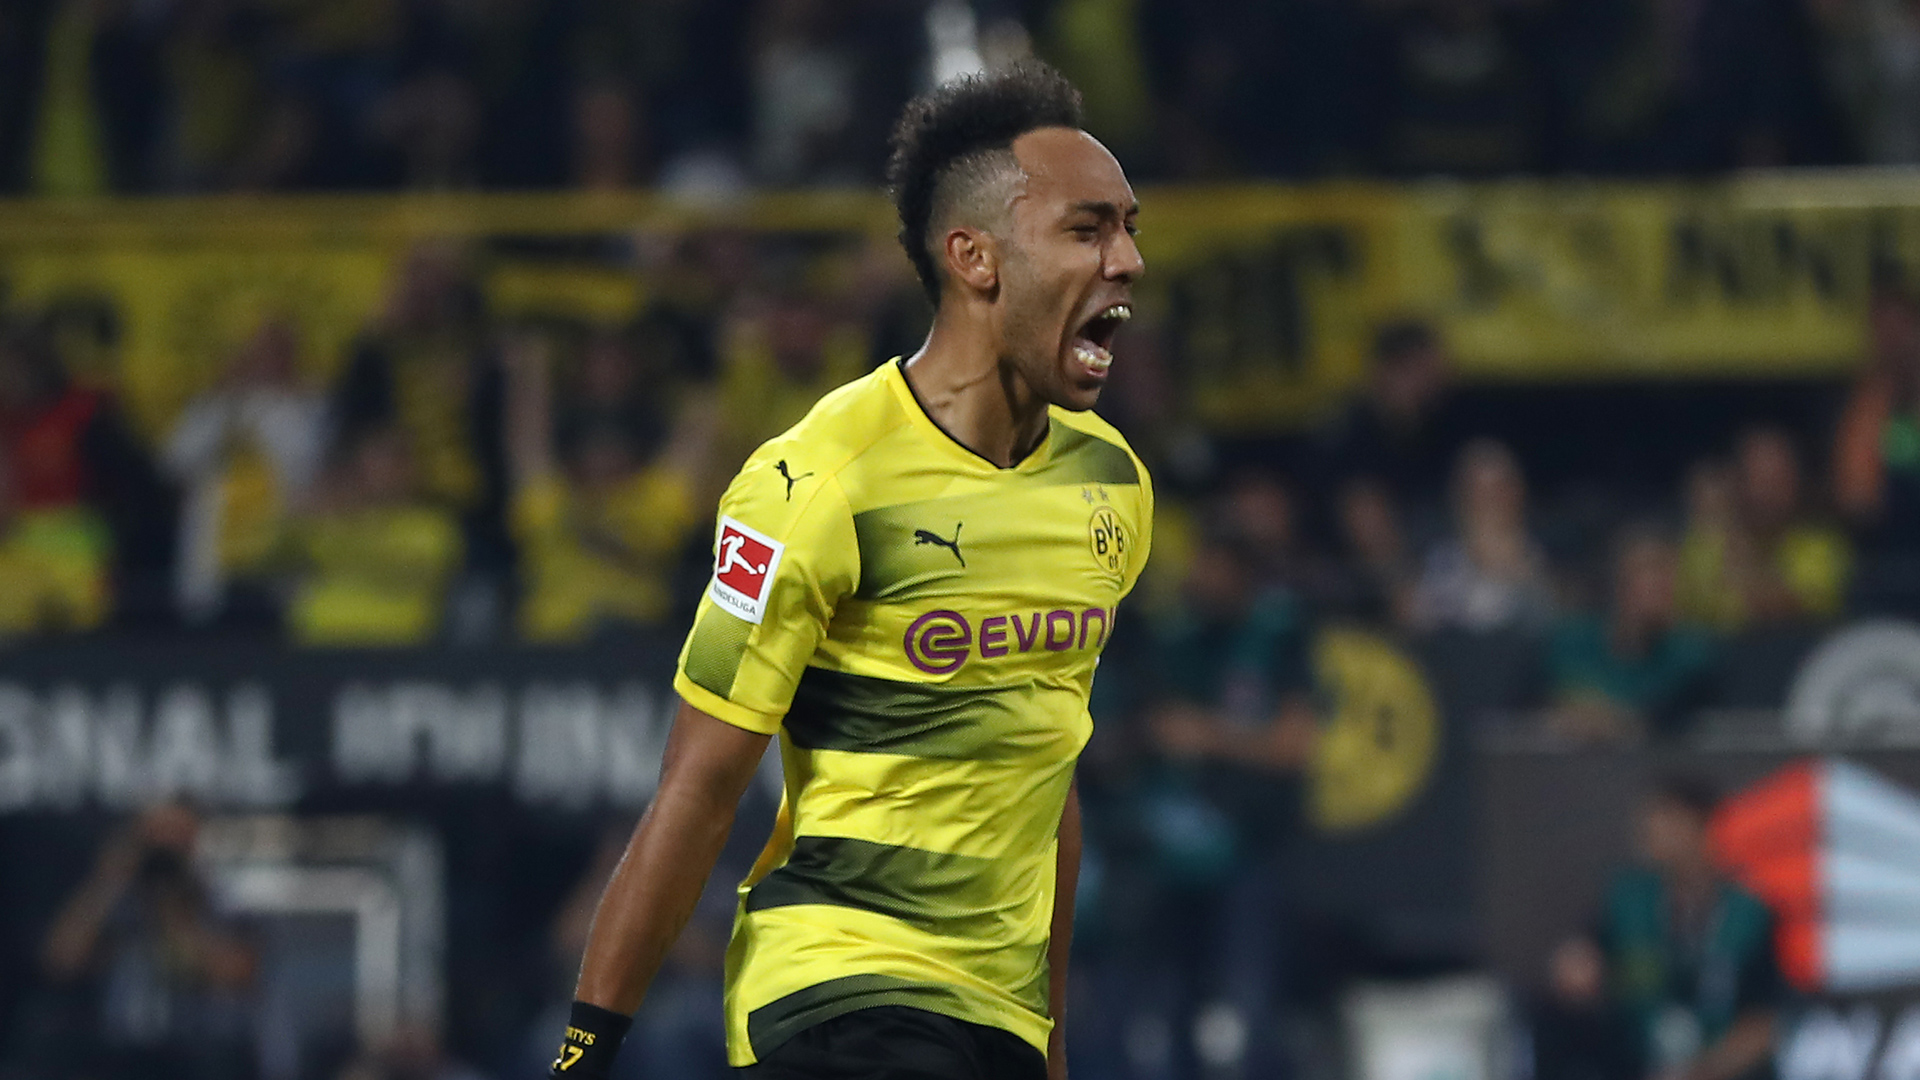 Zorc (DS Borussia Dortmund):